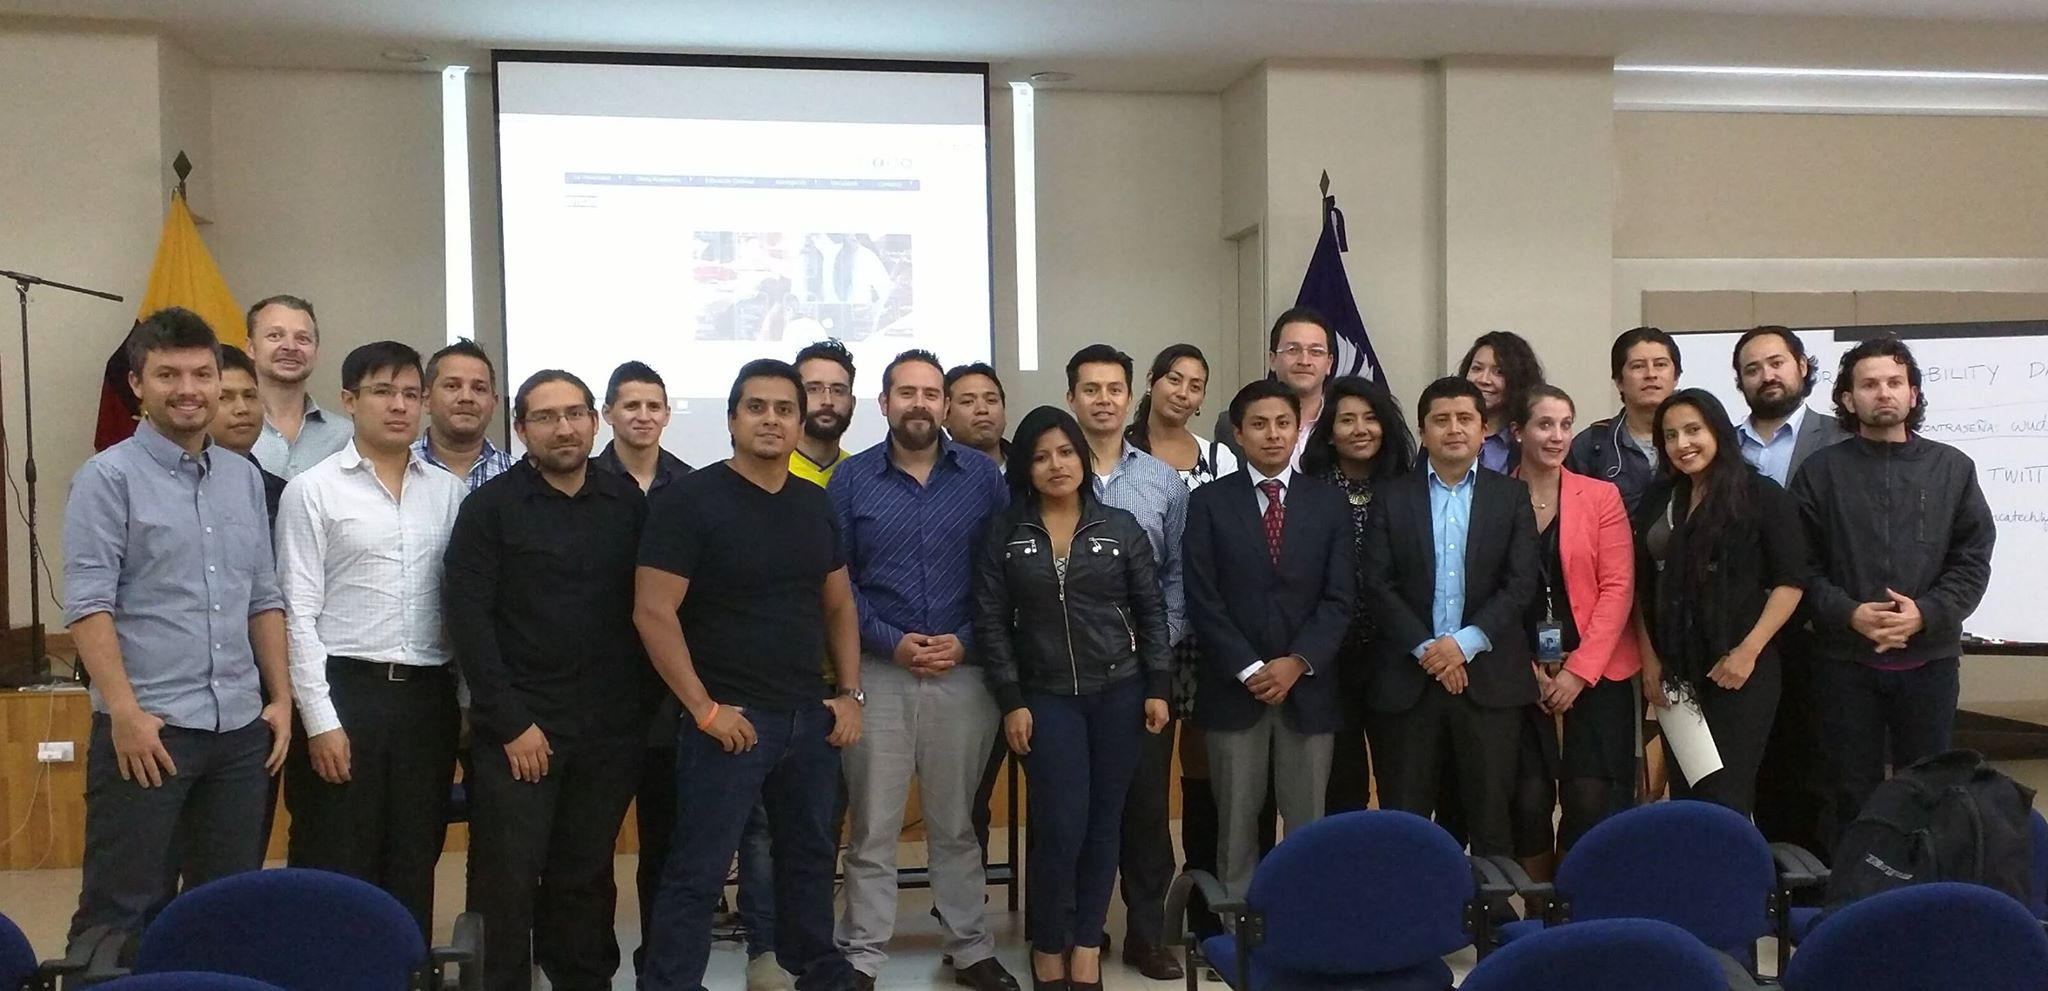 UXPA Ecuador - World Usability Day 2015 - Universidad Tecnológica Indoamérica